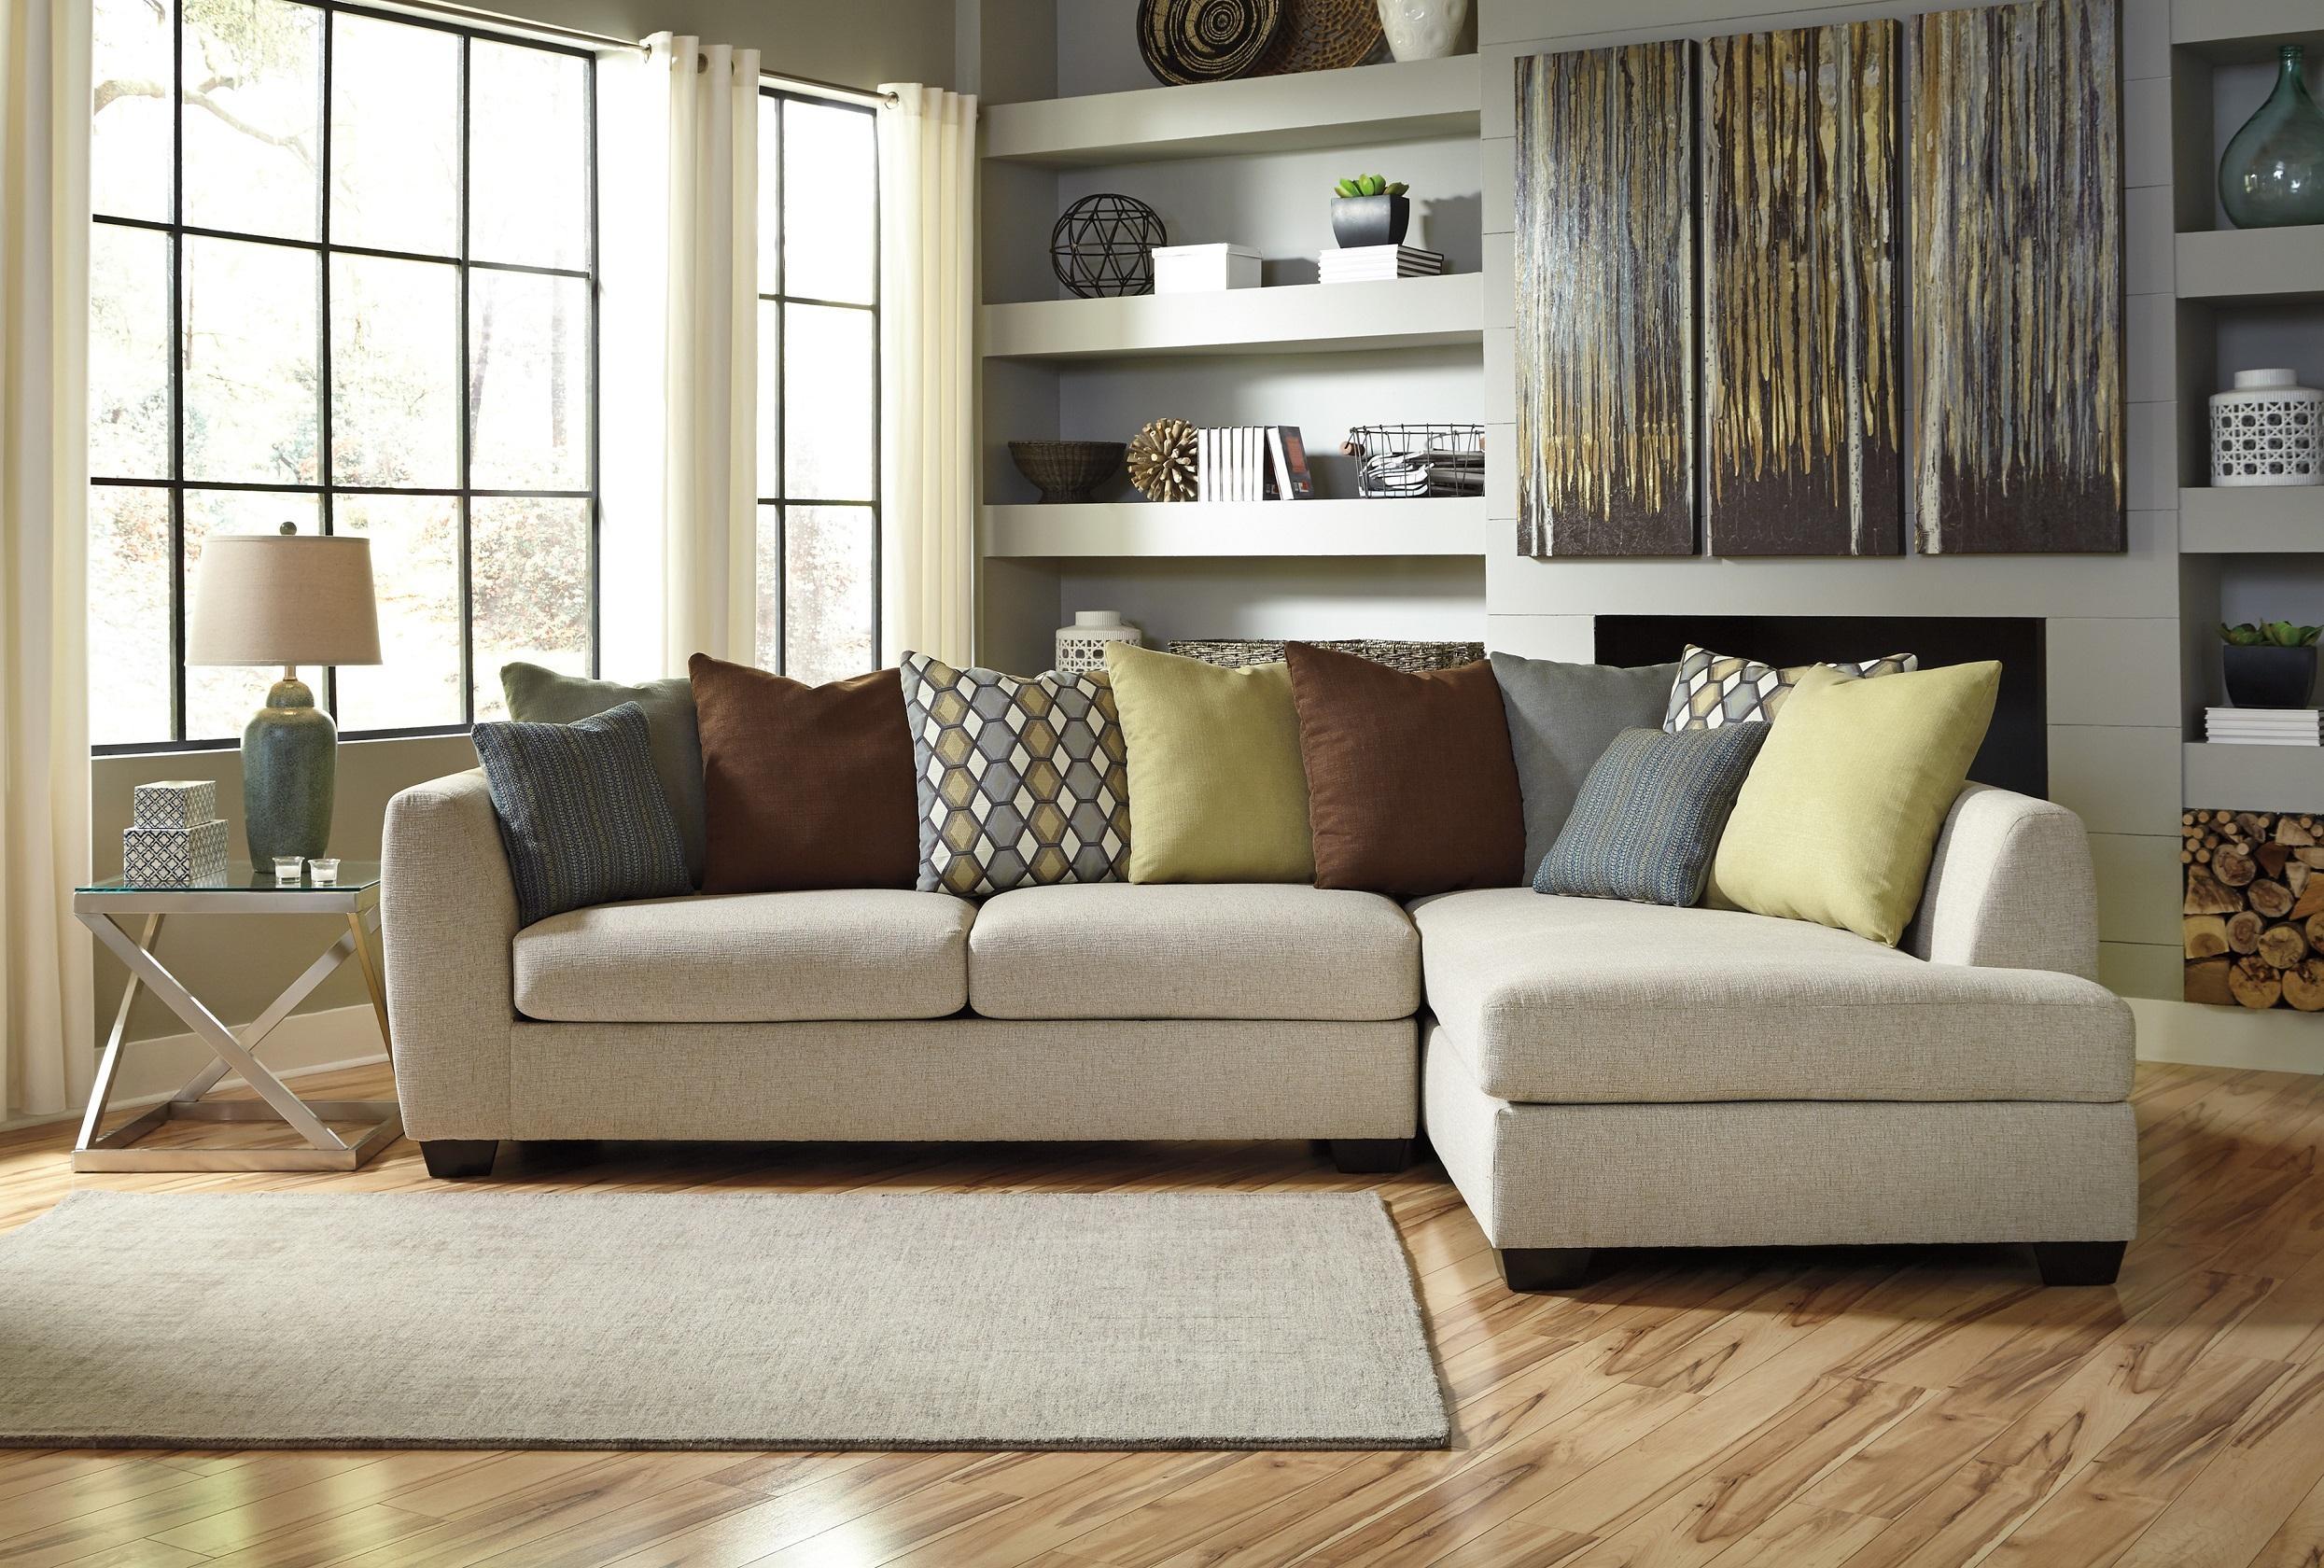 Sofas Center : Singular Ashley Furniture Sectional Sofas Photo Within Sectional Sofas Ashley Furniture (View 19 of 20)